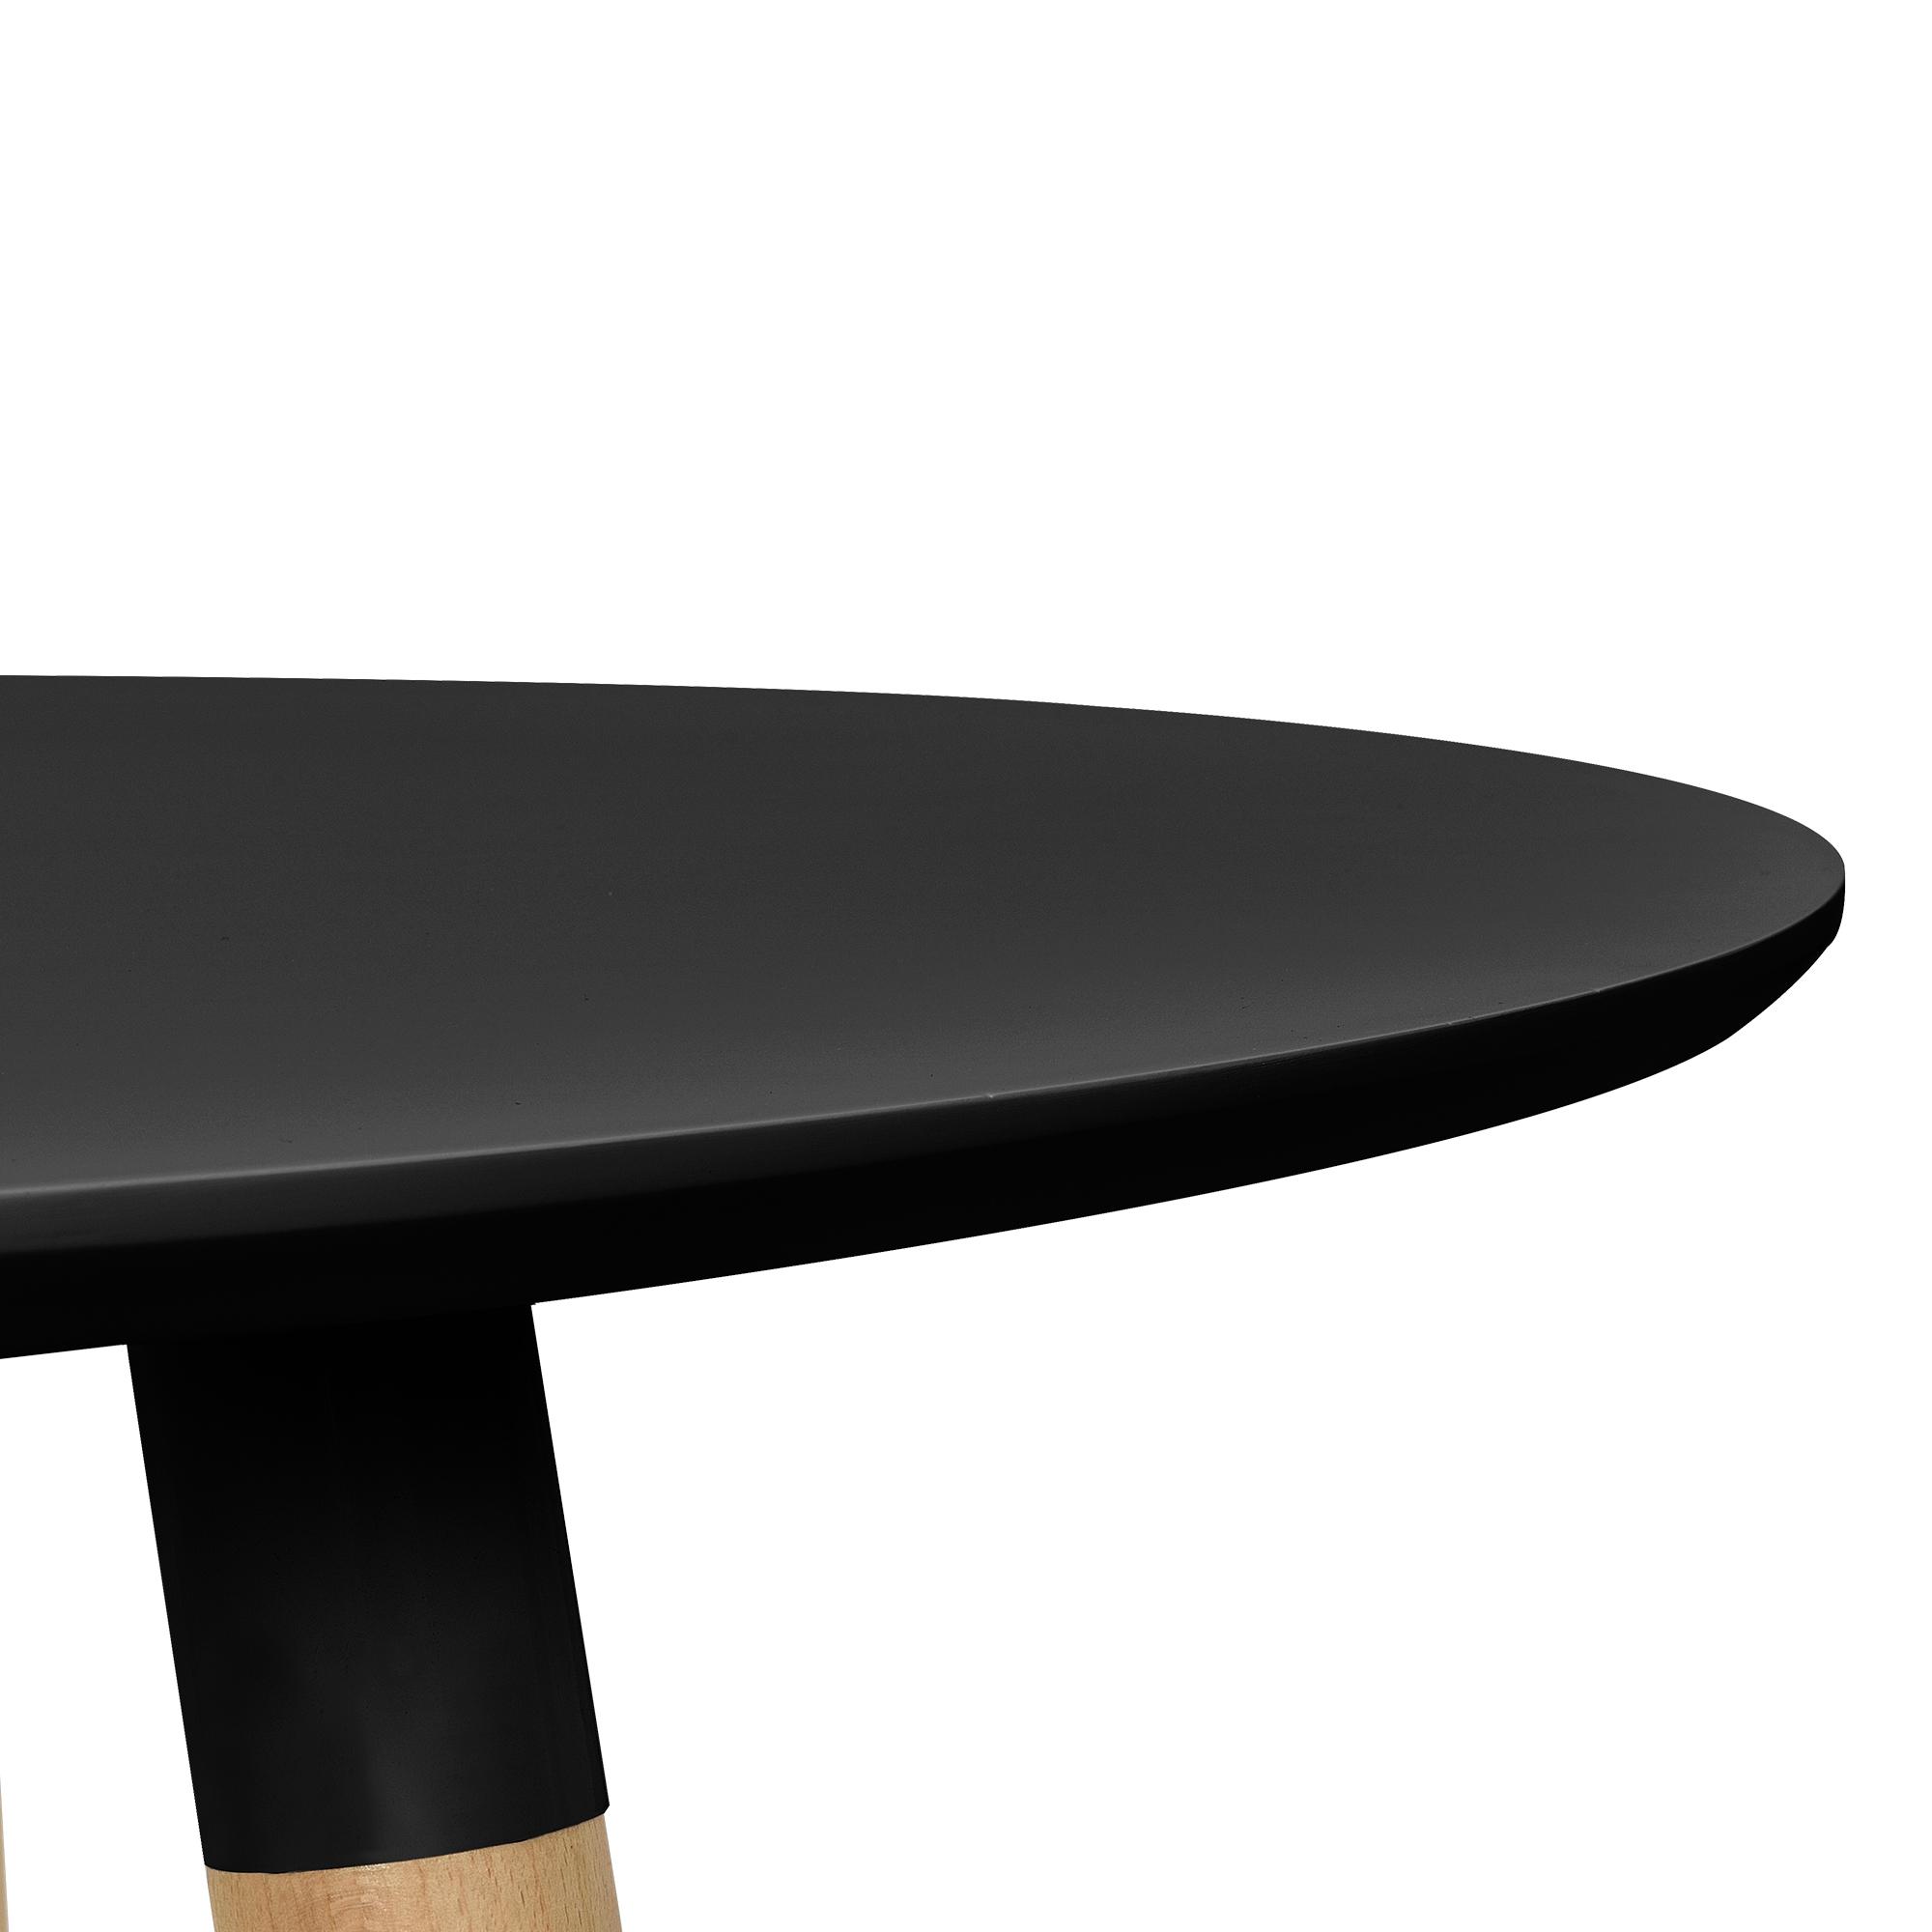 esstisch schwarz mit 3 st hlen wei 80cm essgruppe kunstleder st hle ebay. Black Bedroom Furniture Sets. Home Design Ideas